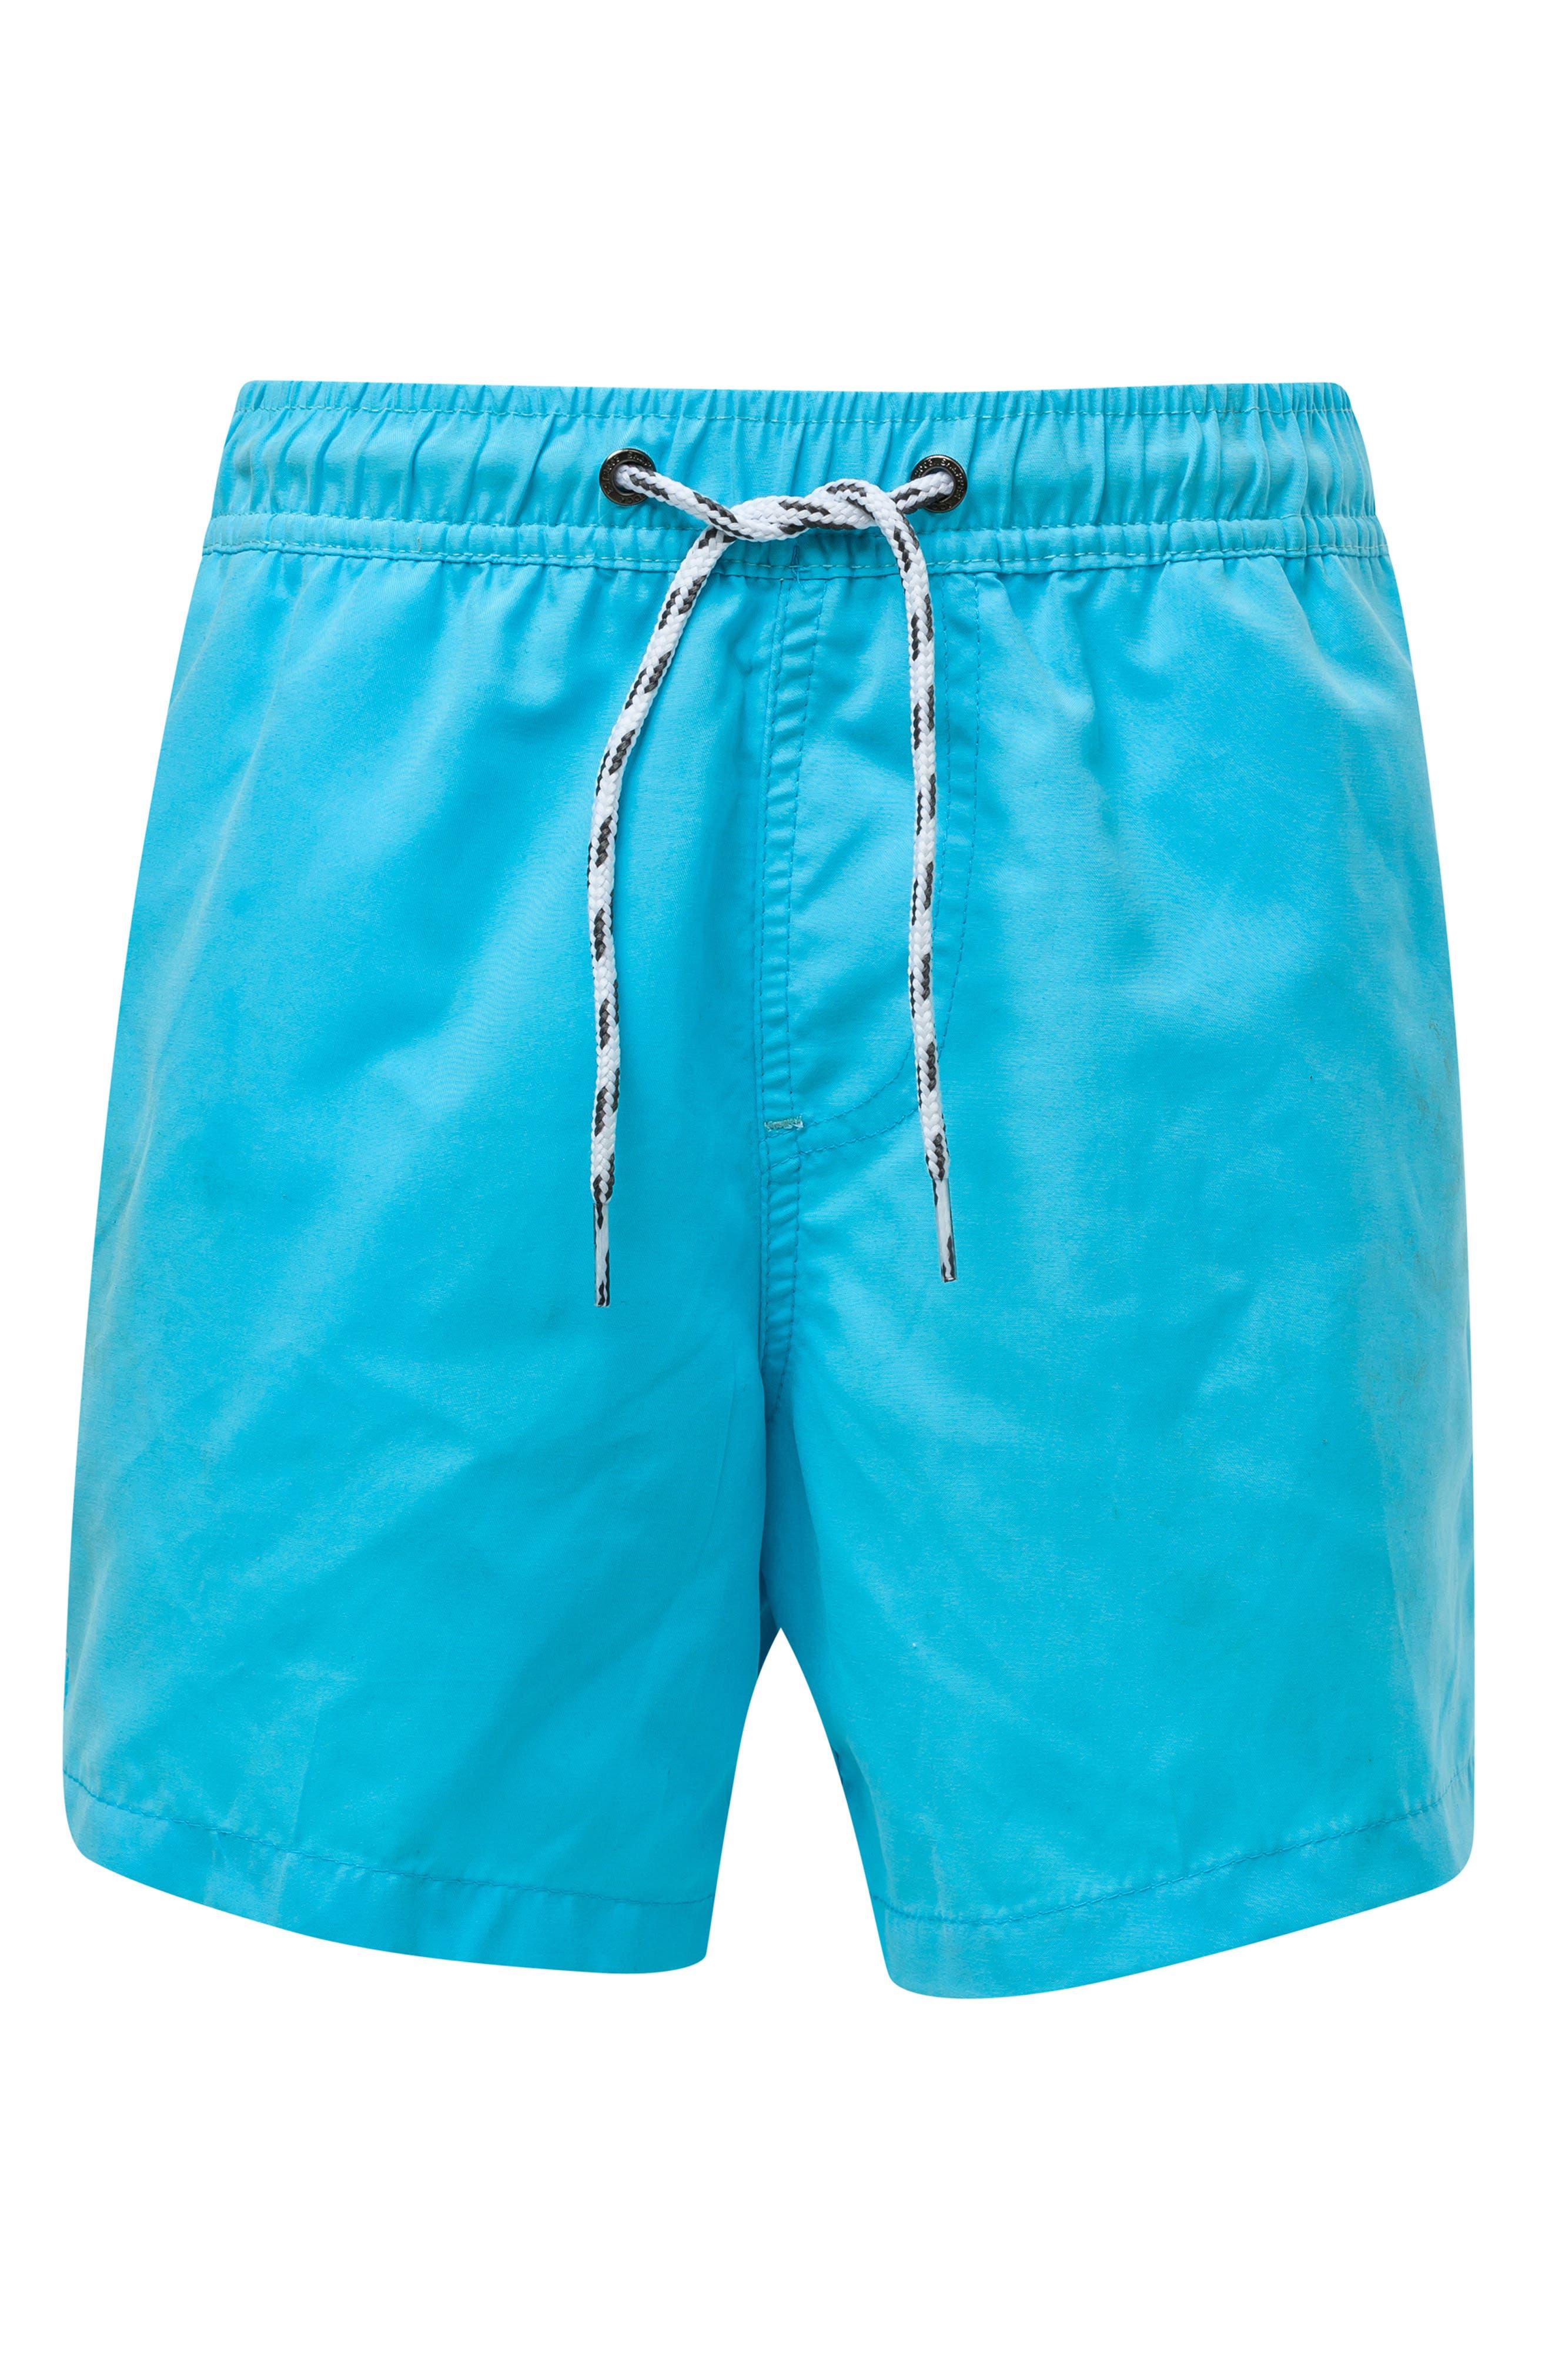 Aqua Board Shorts,                             Main thumbnail 1, color,                             MEDIUM BLUE